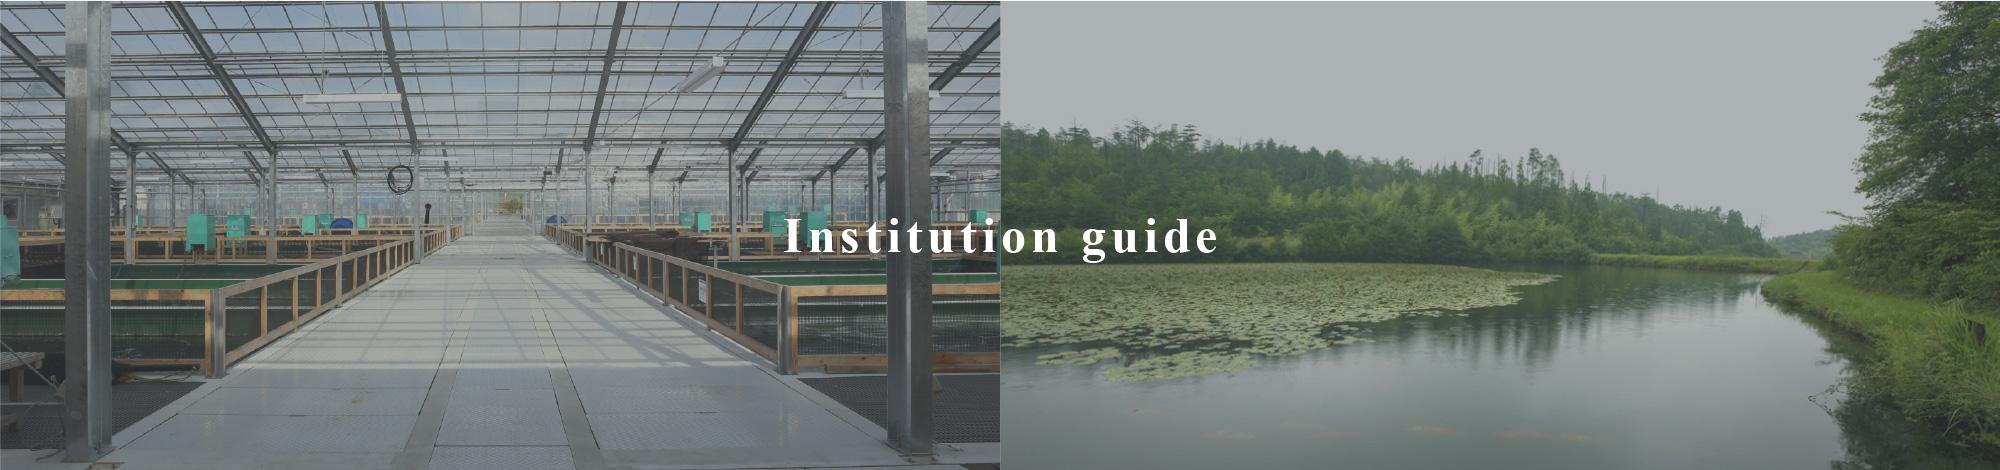 Institution guide